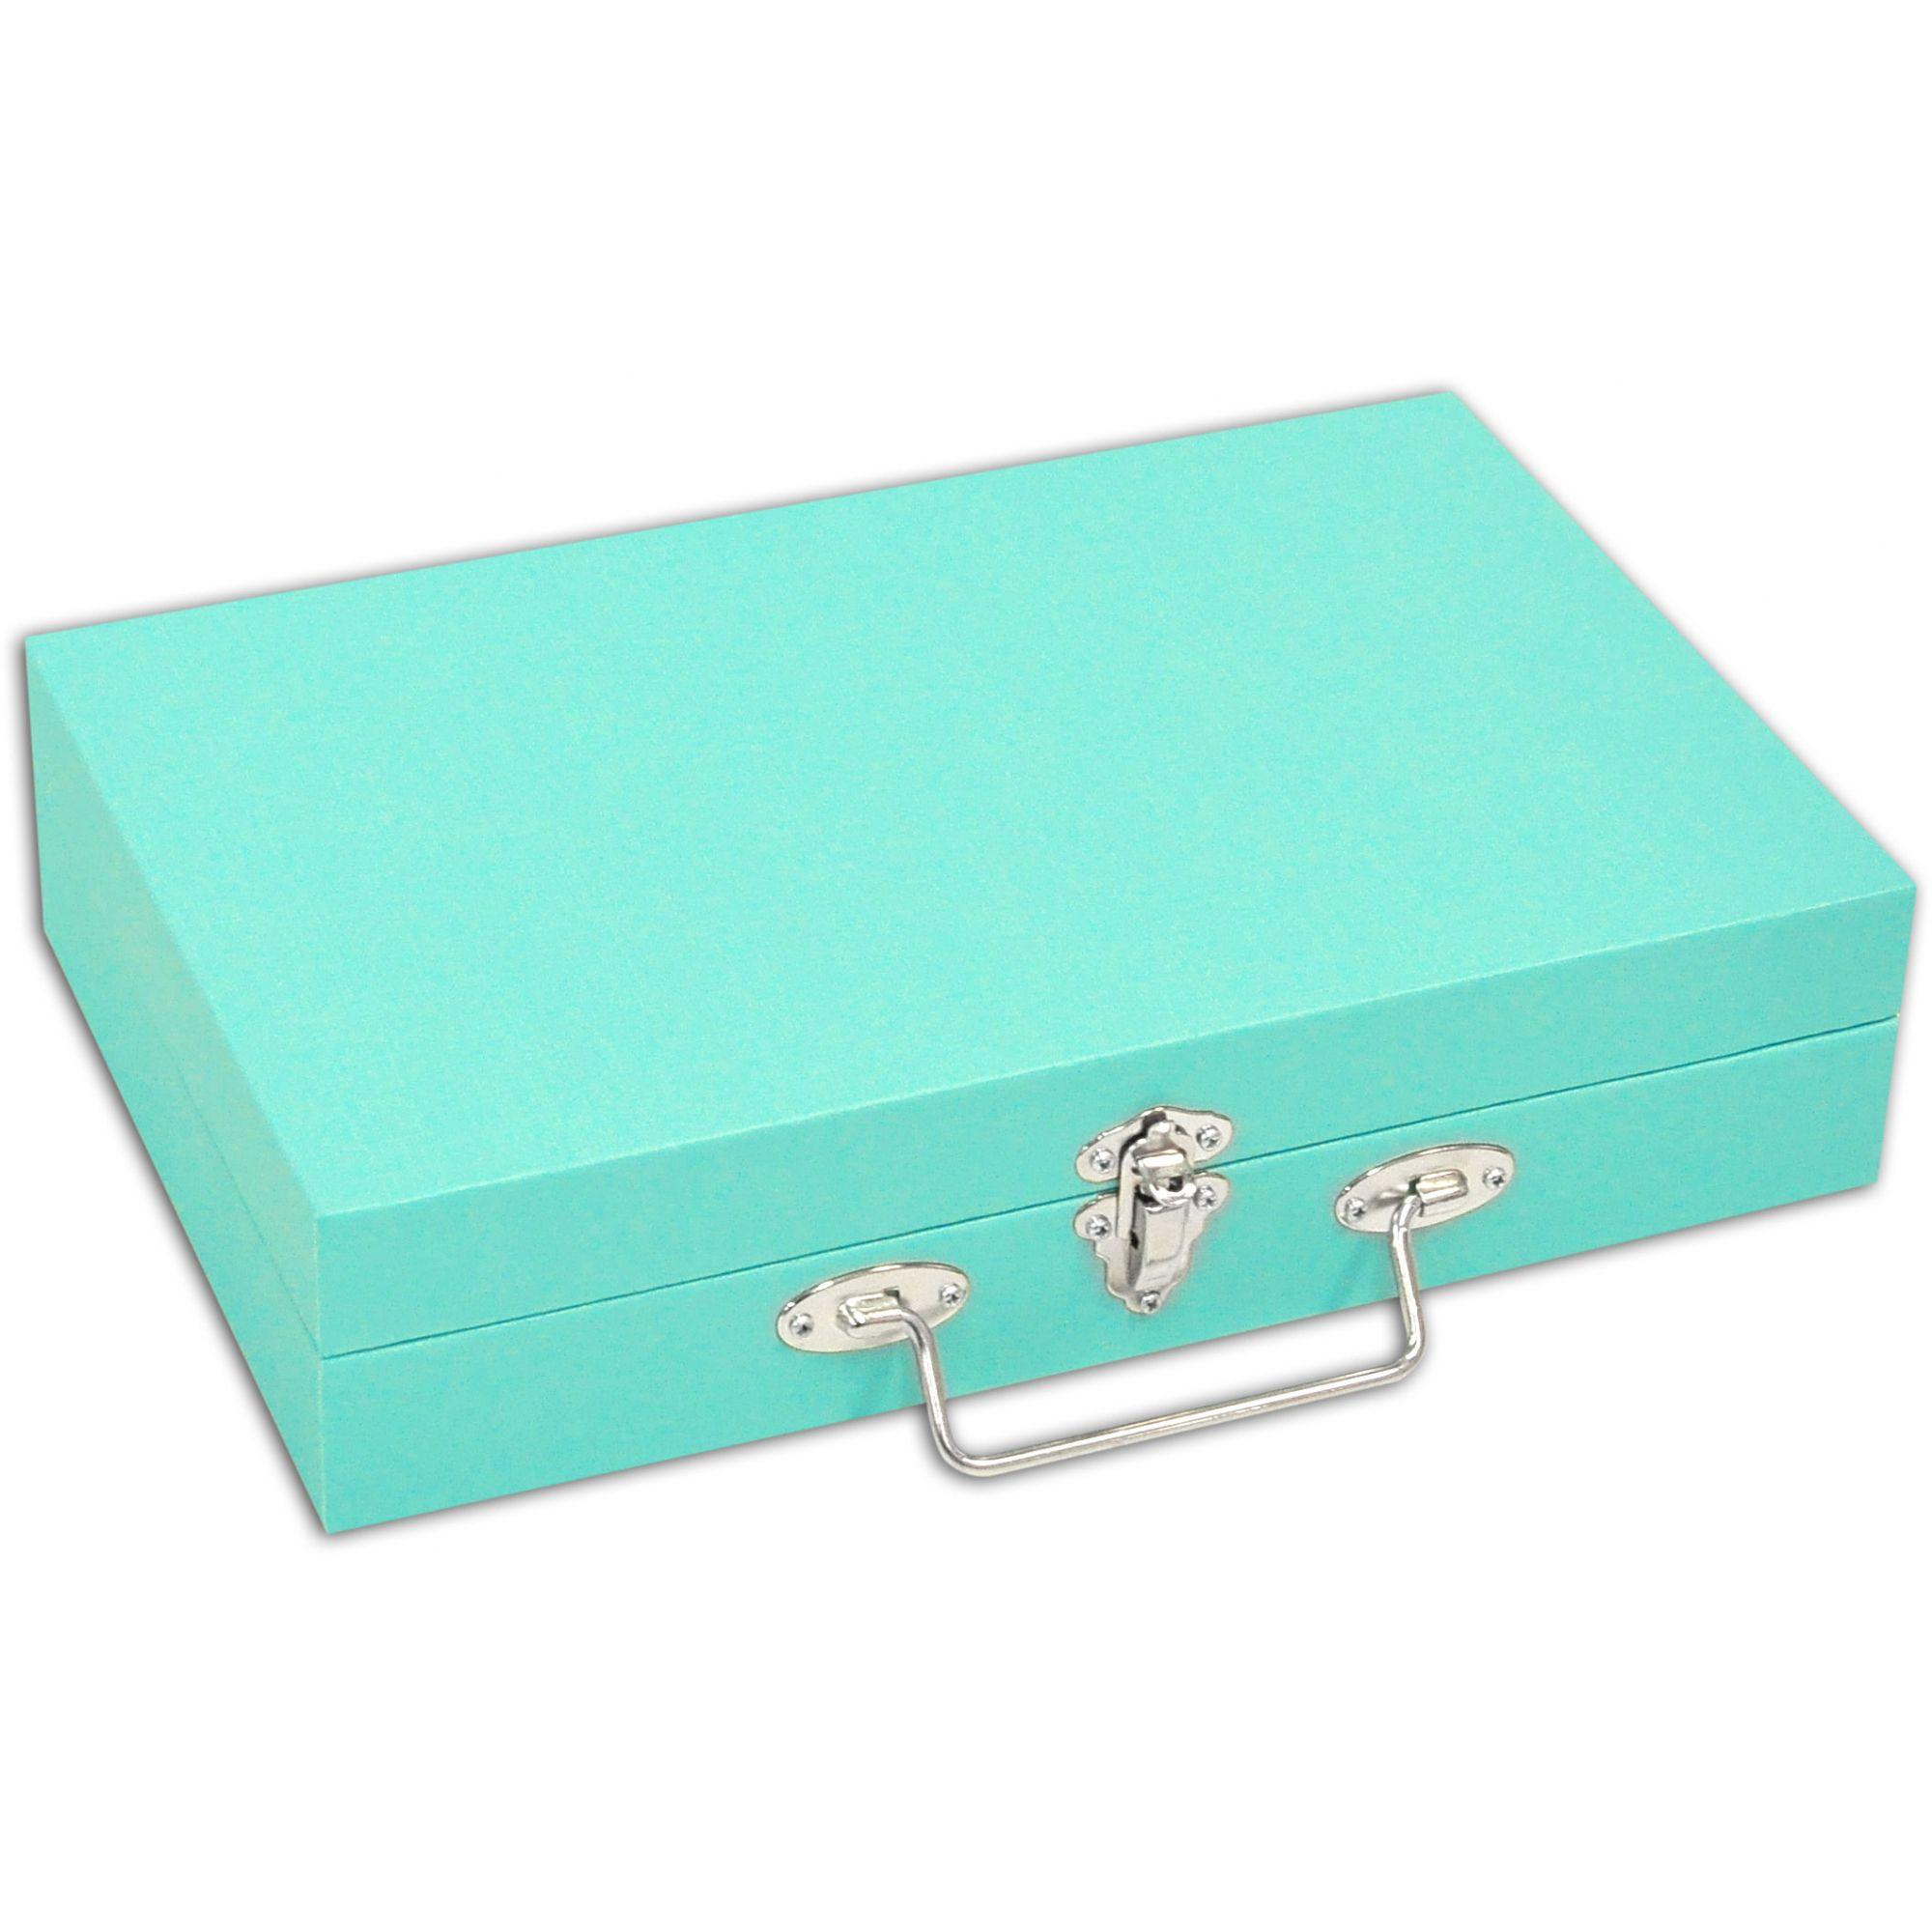 Maleta / Porta Joias Médio - Tiffany Blue / Cinza